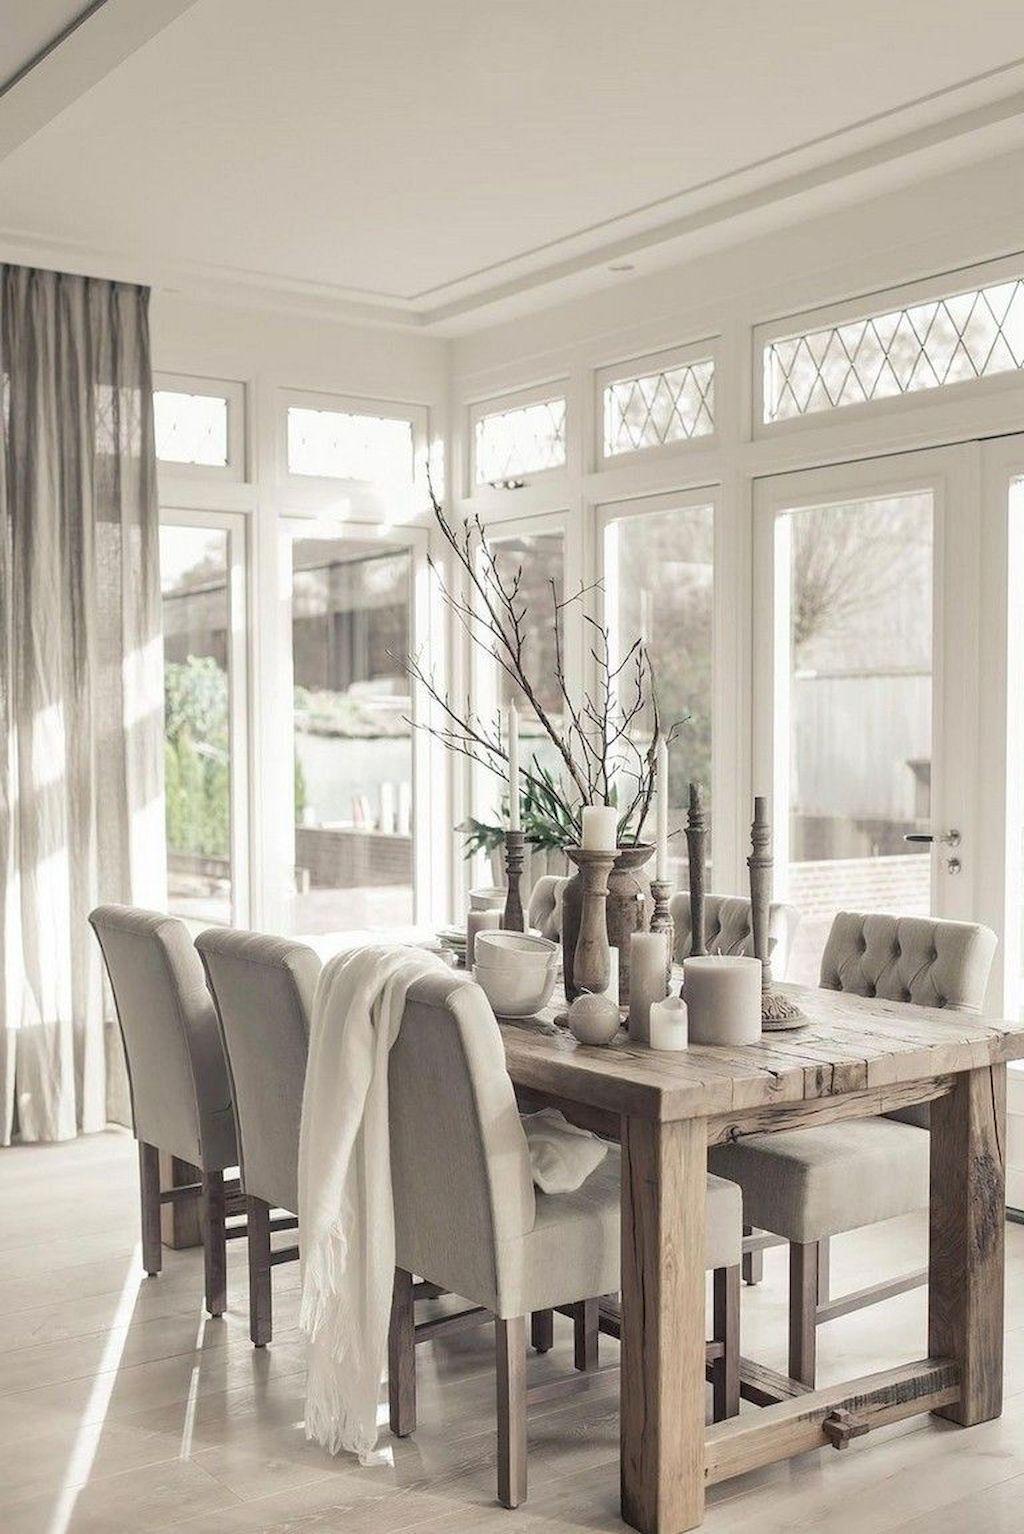 Adorable Farmhouse Dining Room Design Ideas21